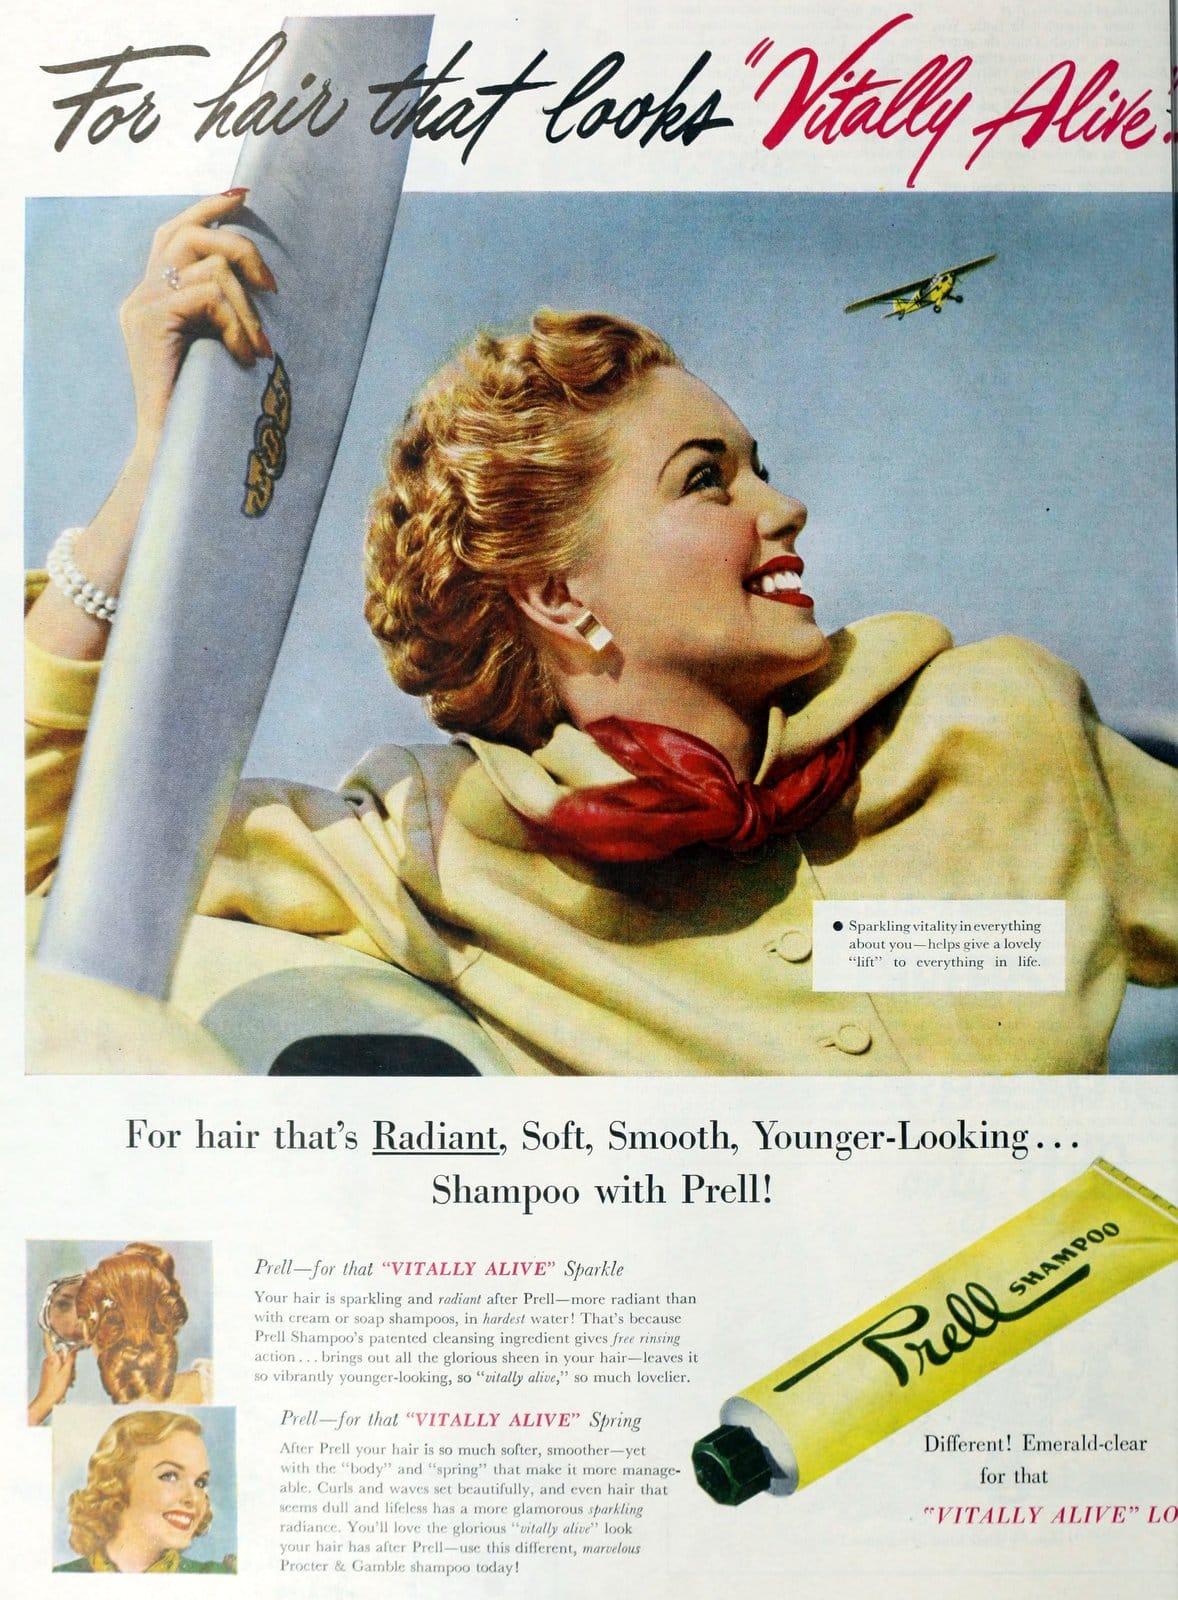 Emerald clear Prell shampoo (1950)